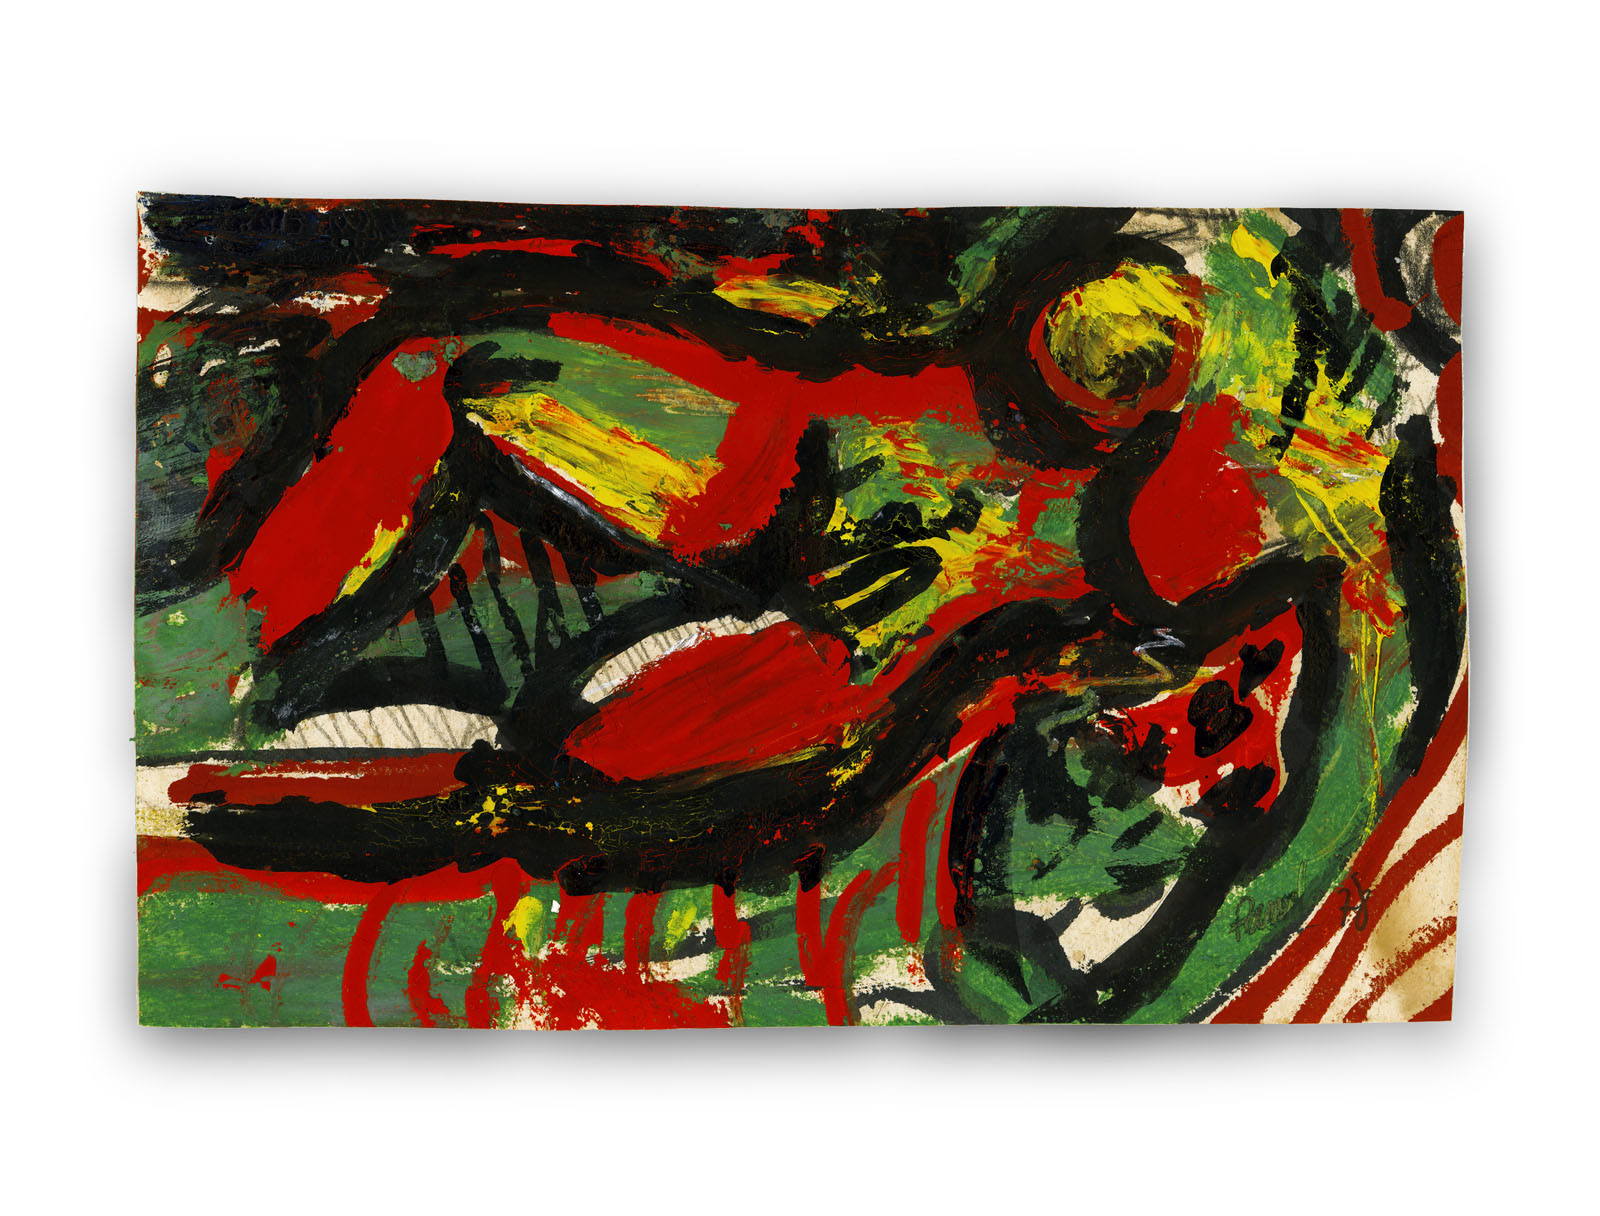 danielvillalobos-spanish-painting-twentiethcentury-cubism-23